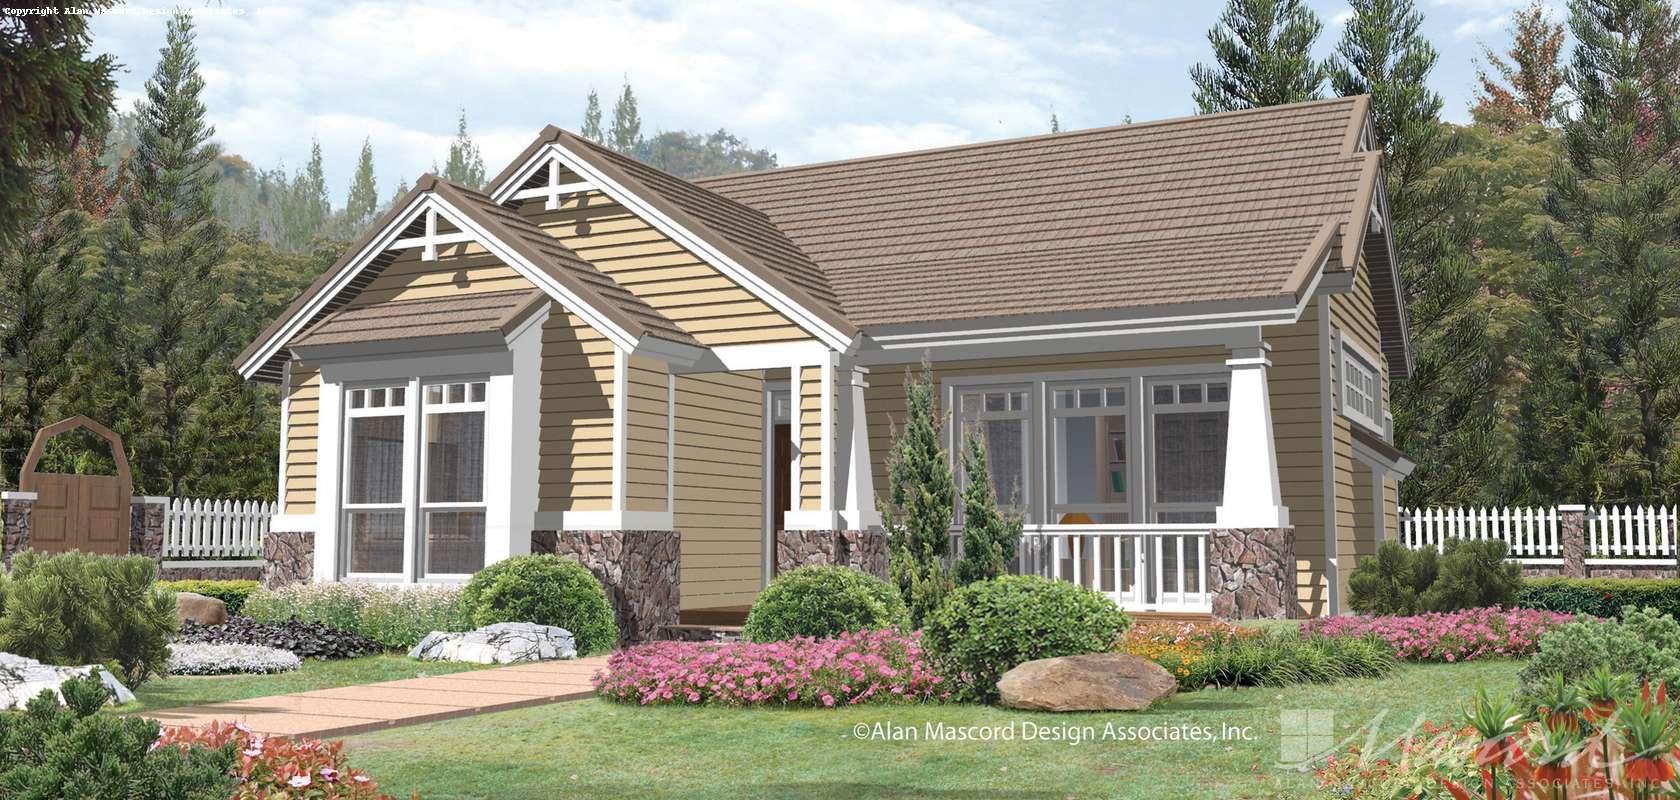 Mascord House Plan 1101: The Brogan